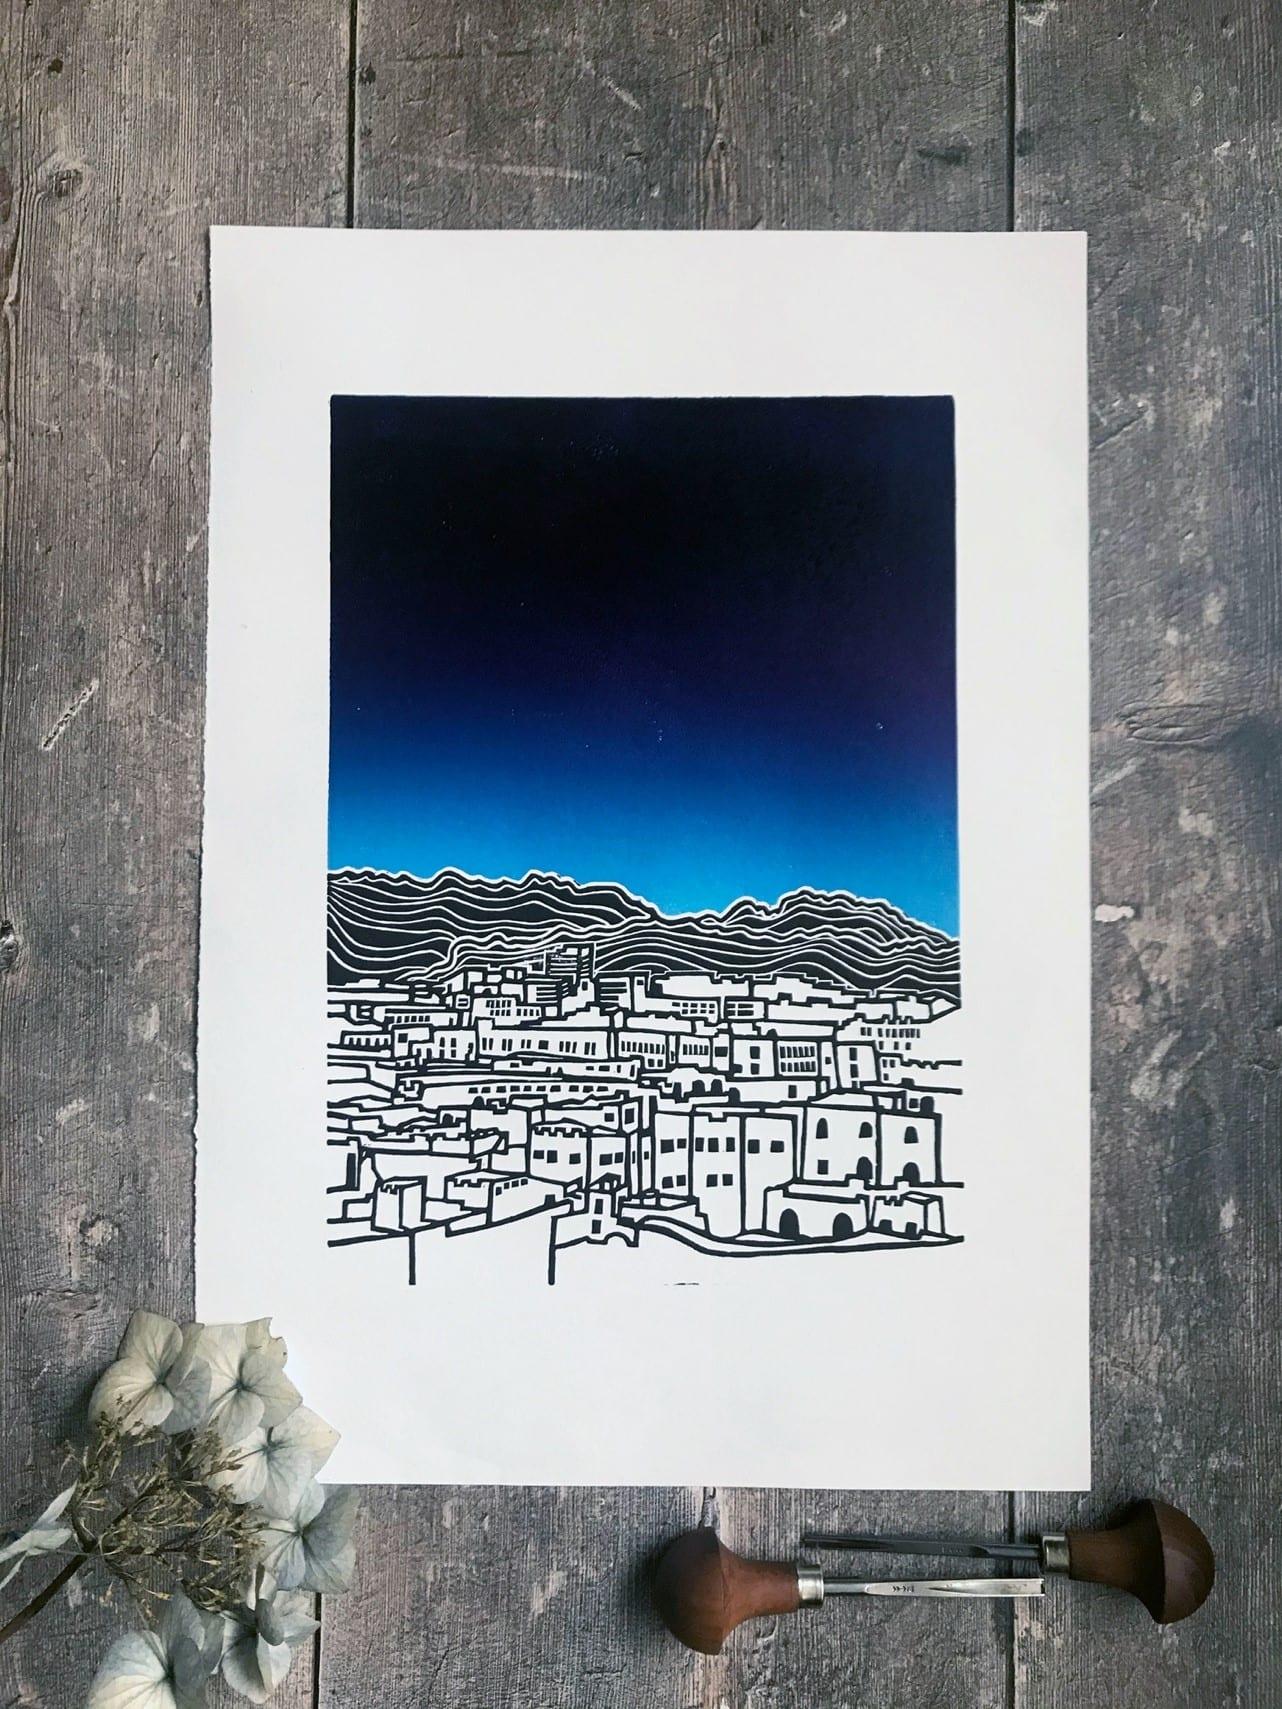 Lino print of city with a brilliant blue sky